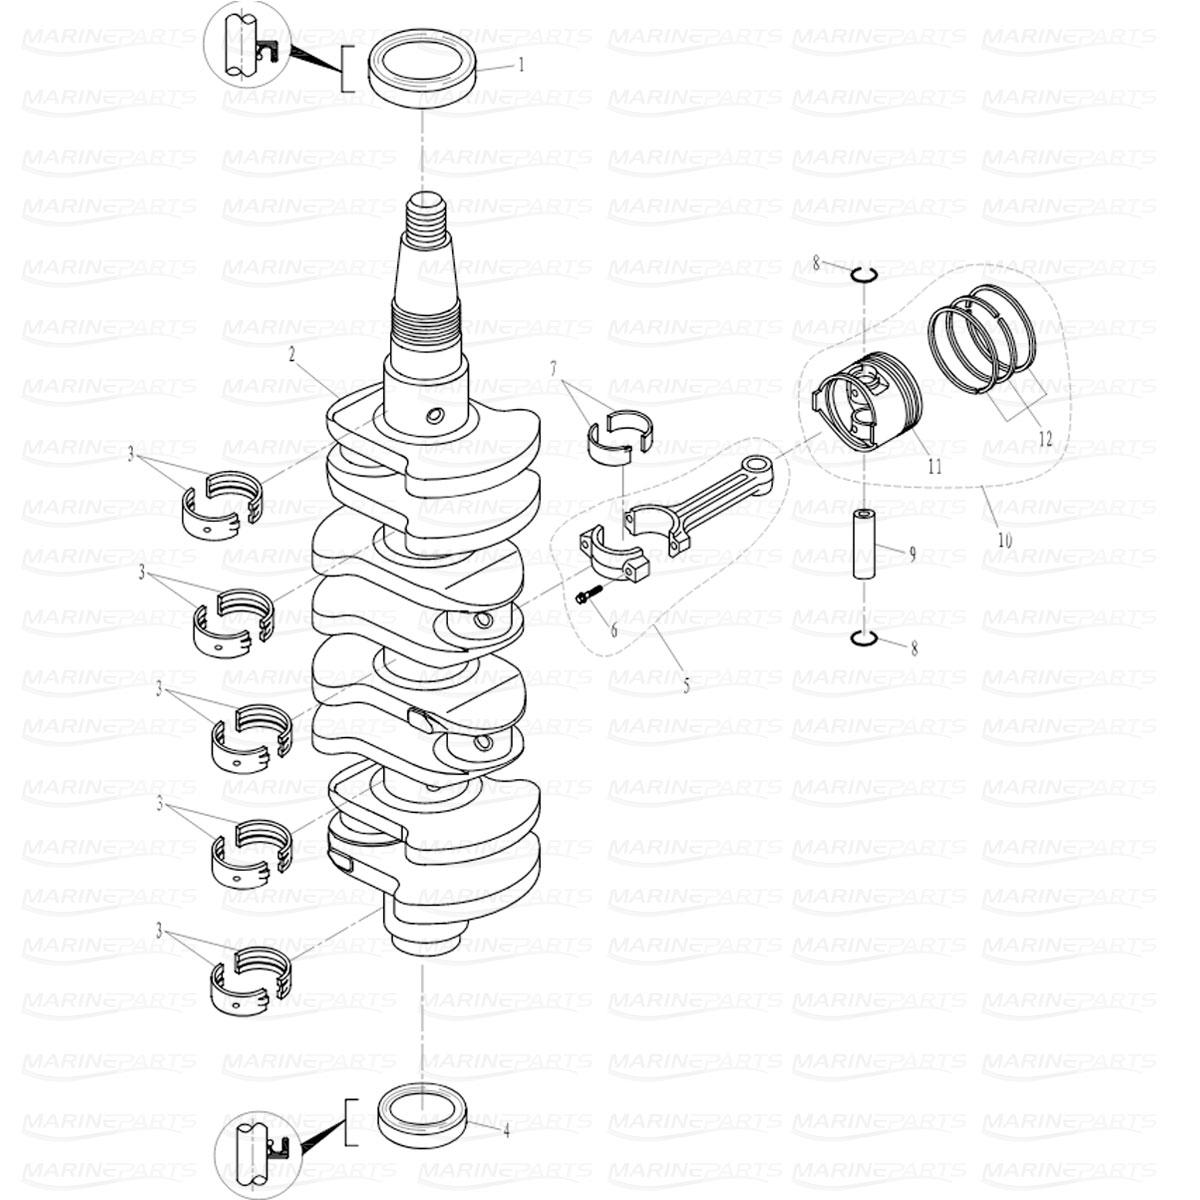 Crankshaft and piston